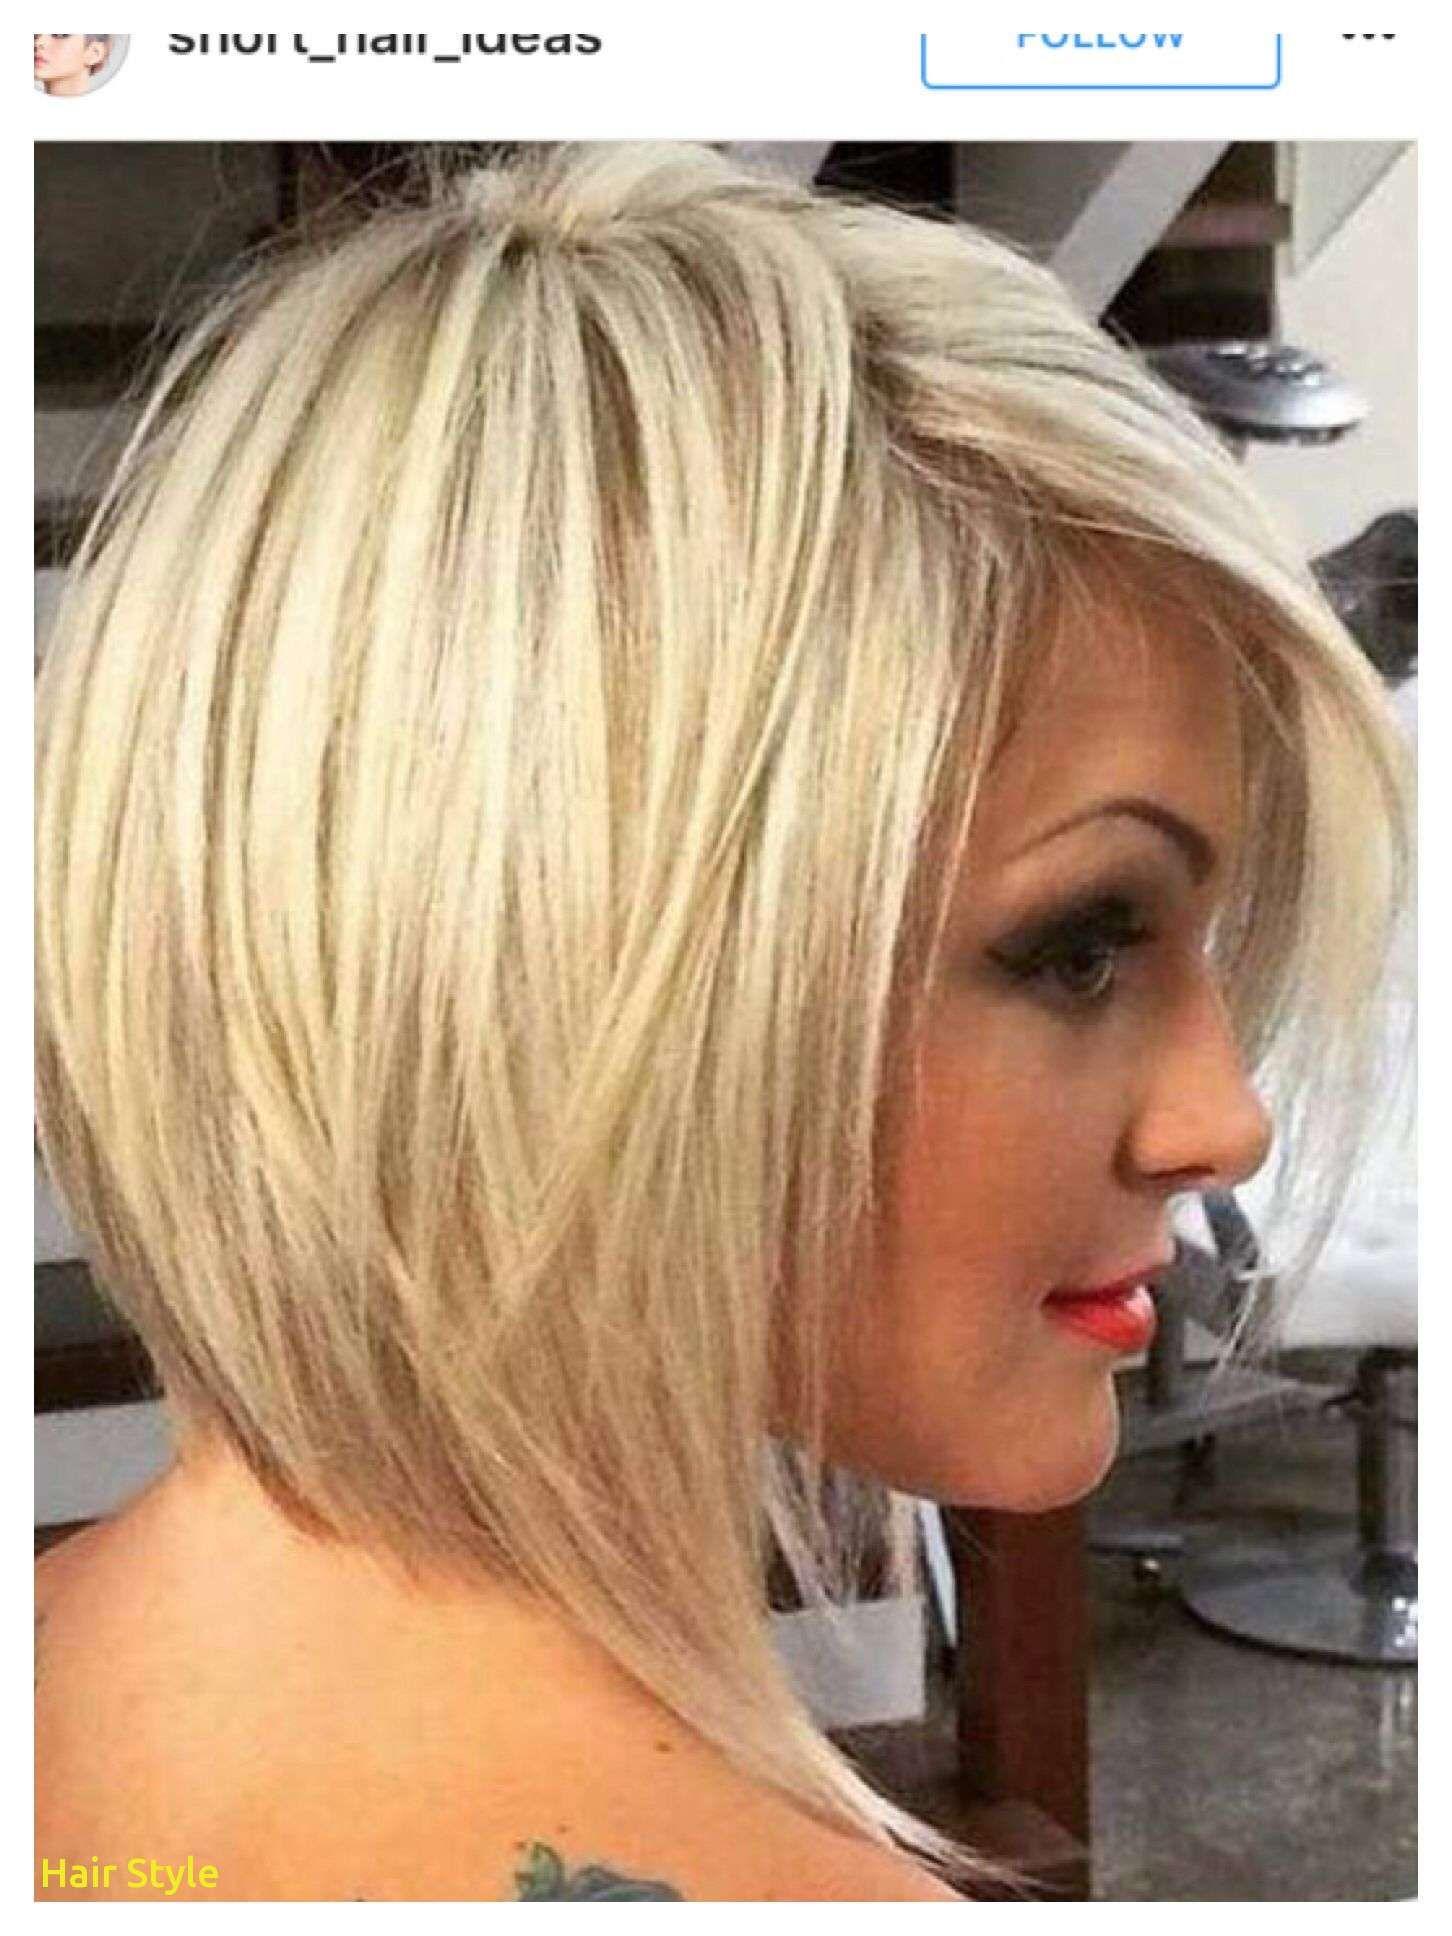 Super Bob Frisuren 2018 Frisurenkurz 2018hinterkopf 2018zeitlose Erstaunlichbob Frisurenbilder Haircut Einfachefris Bob Frisur Haarschnitt Frisuren 2016